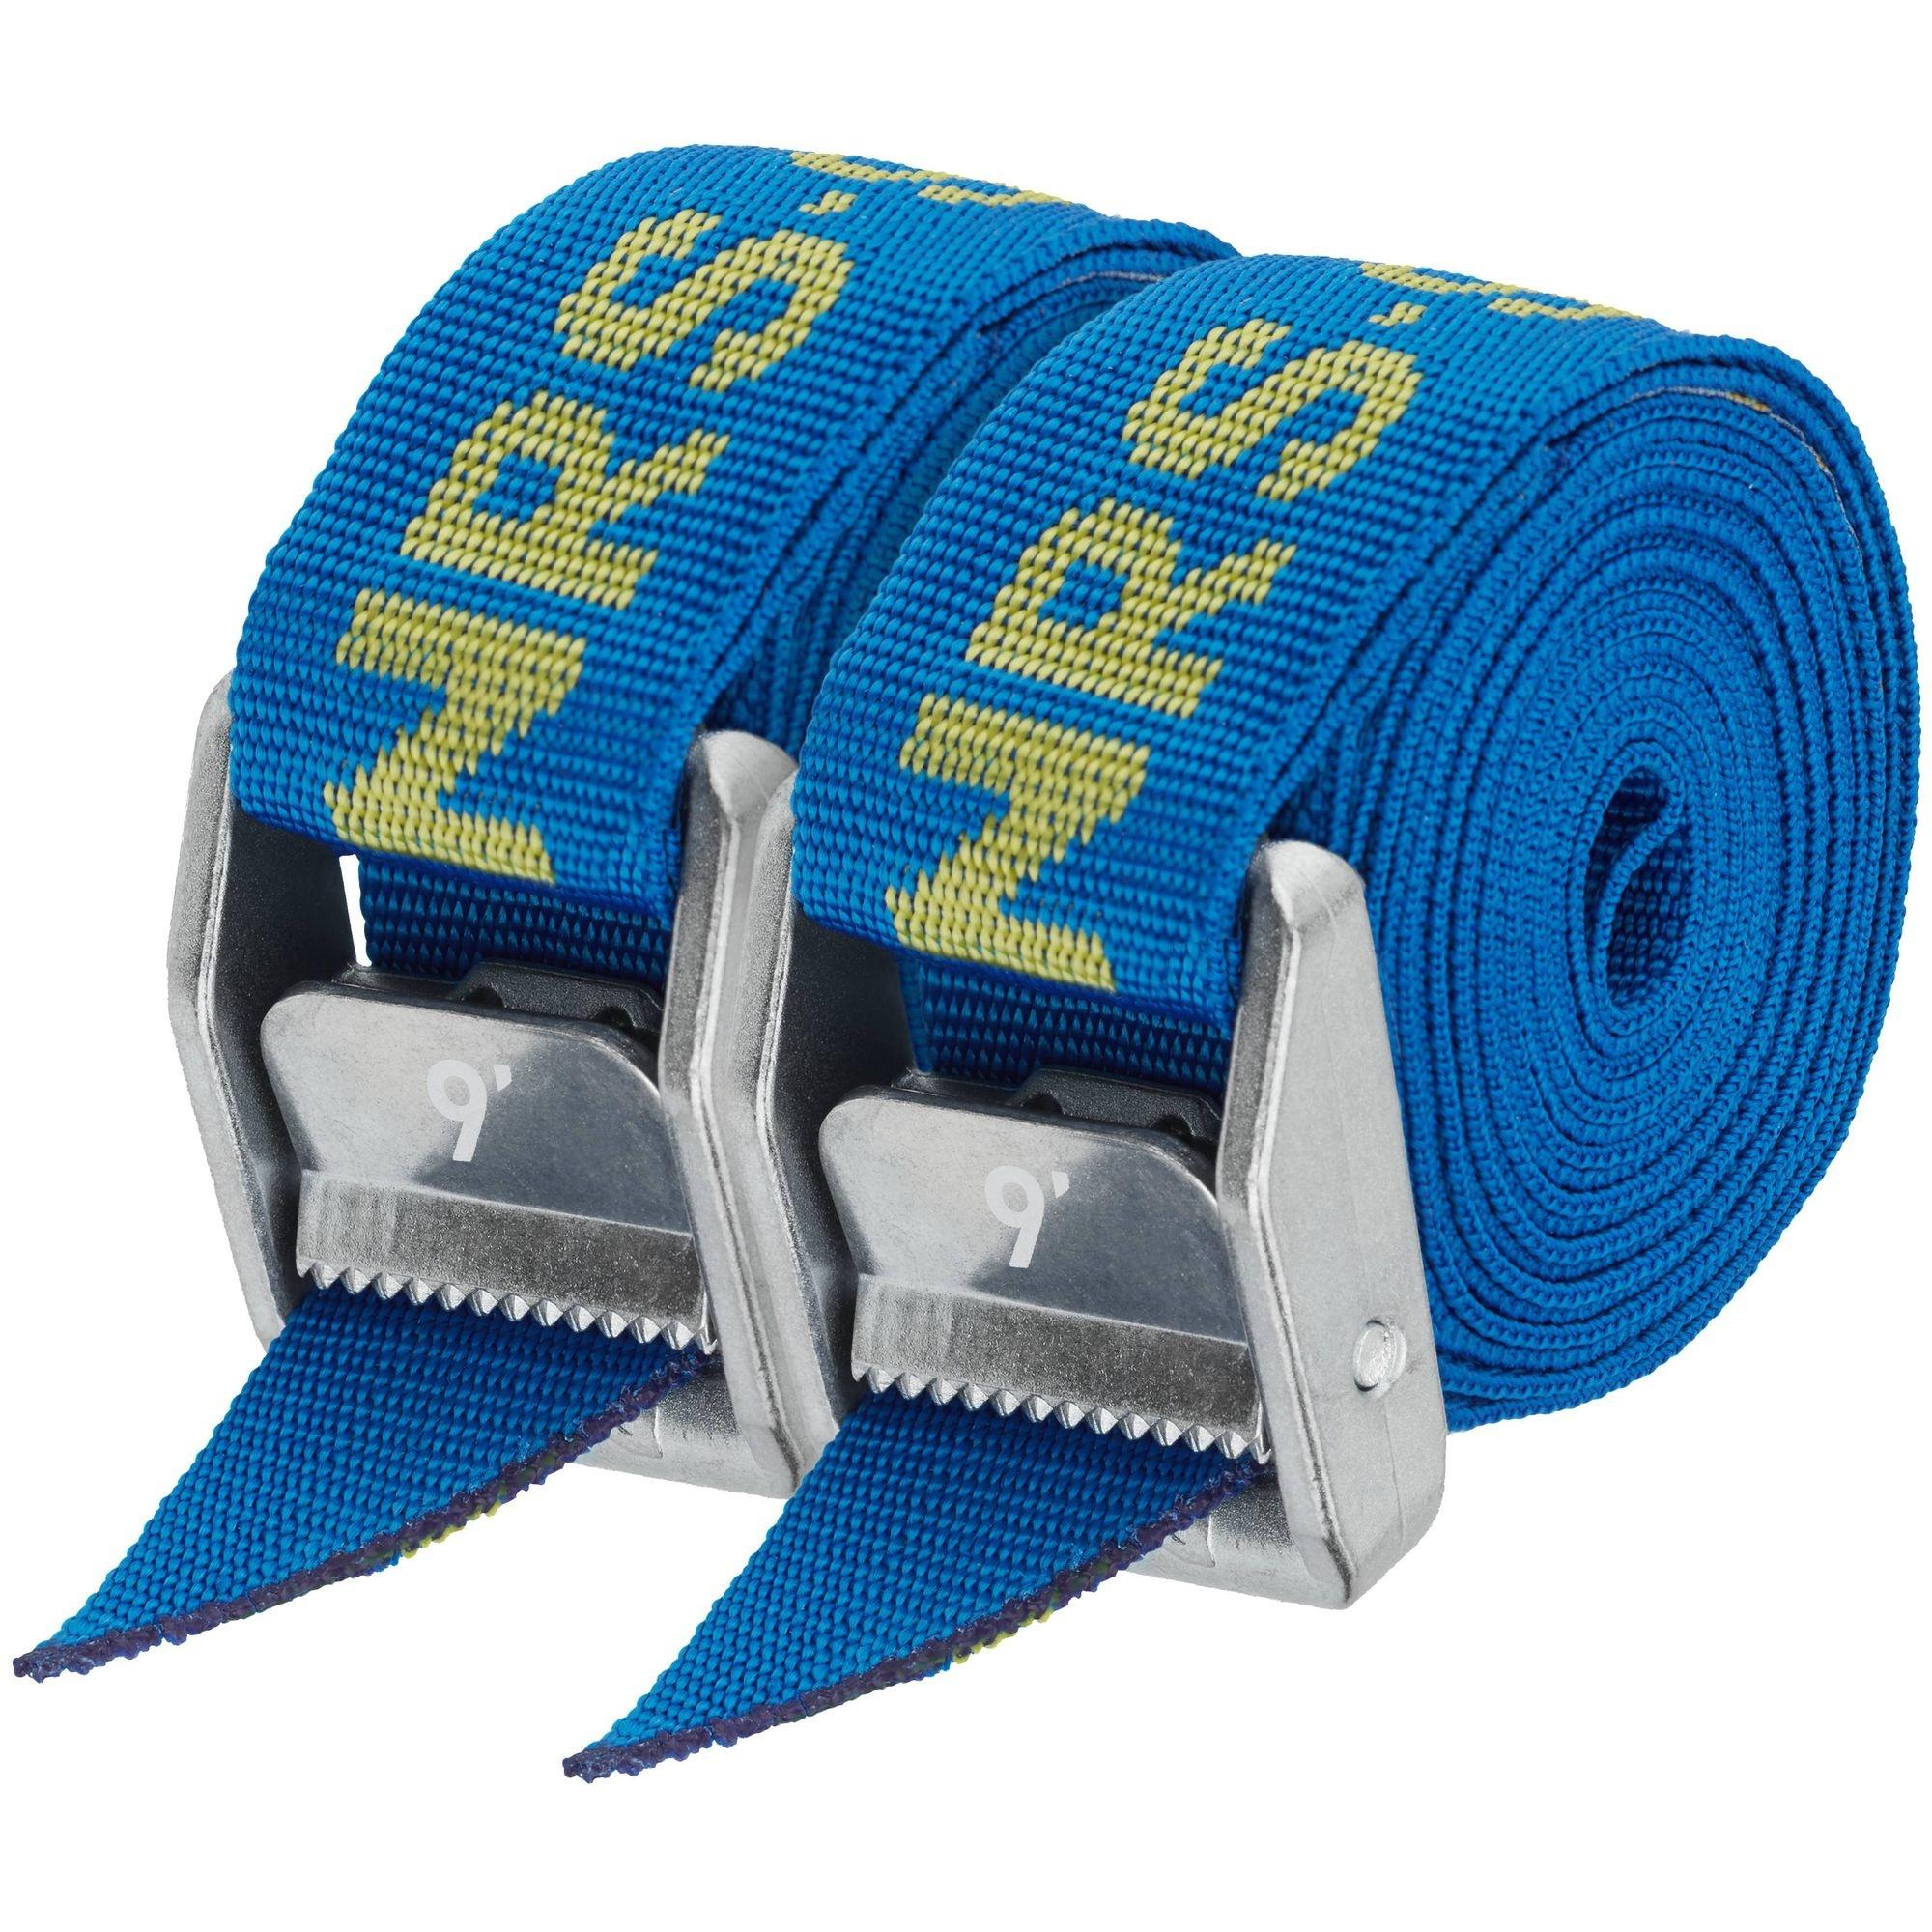 "NRS NRS 1.5"" HD Tie Down Straps - PAIR"